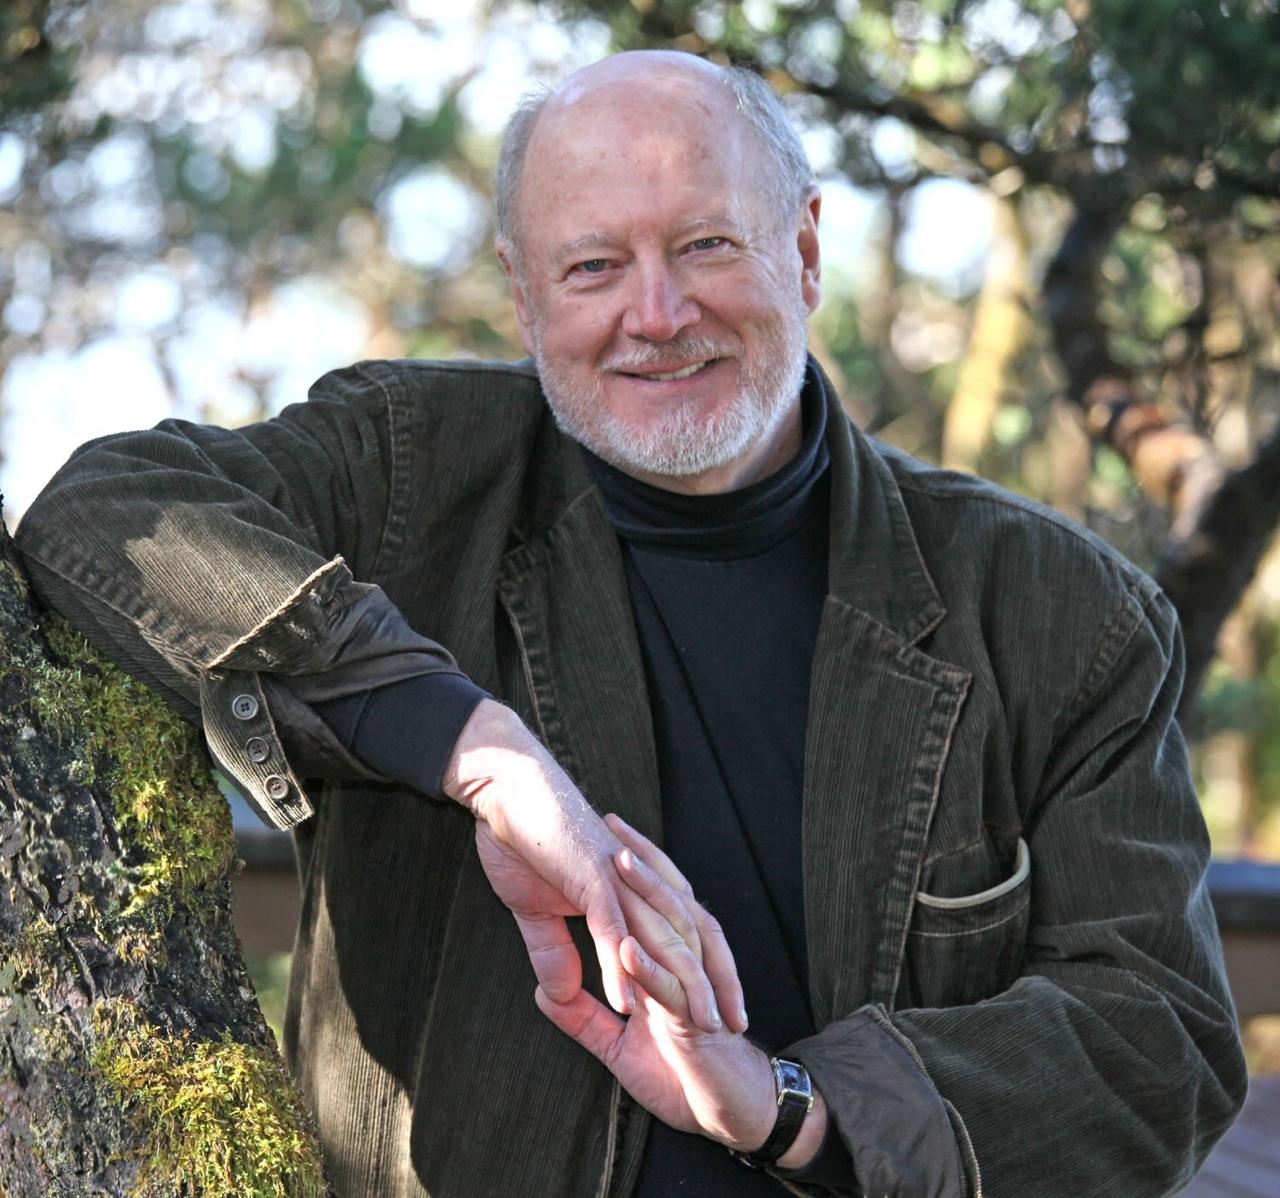 David Ogden Stiers posing for a photo.